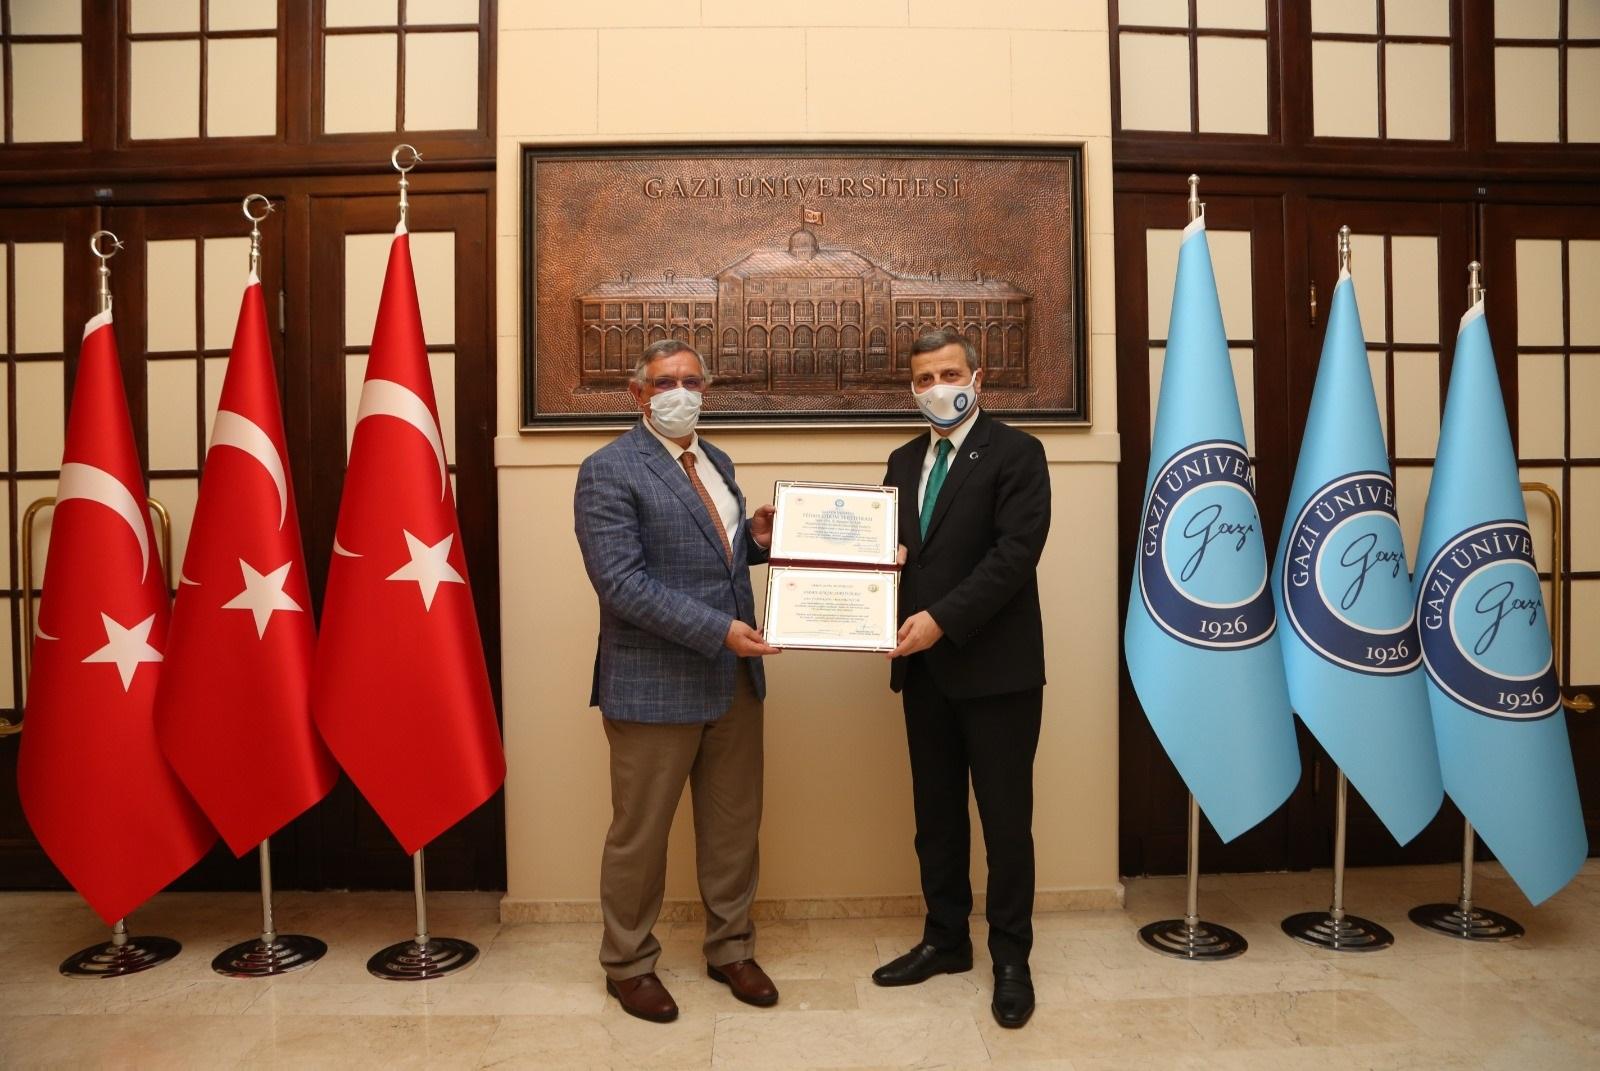 Kyrgyzstan-Turkey Manas University Rector Prof. Dr. Alpaslan Ceylan visited our Rector Prof. Dr. Musa Yıldız